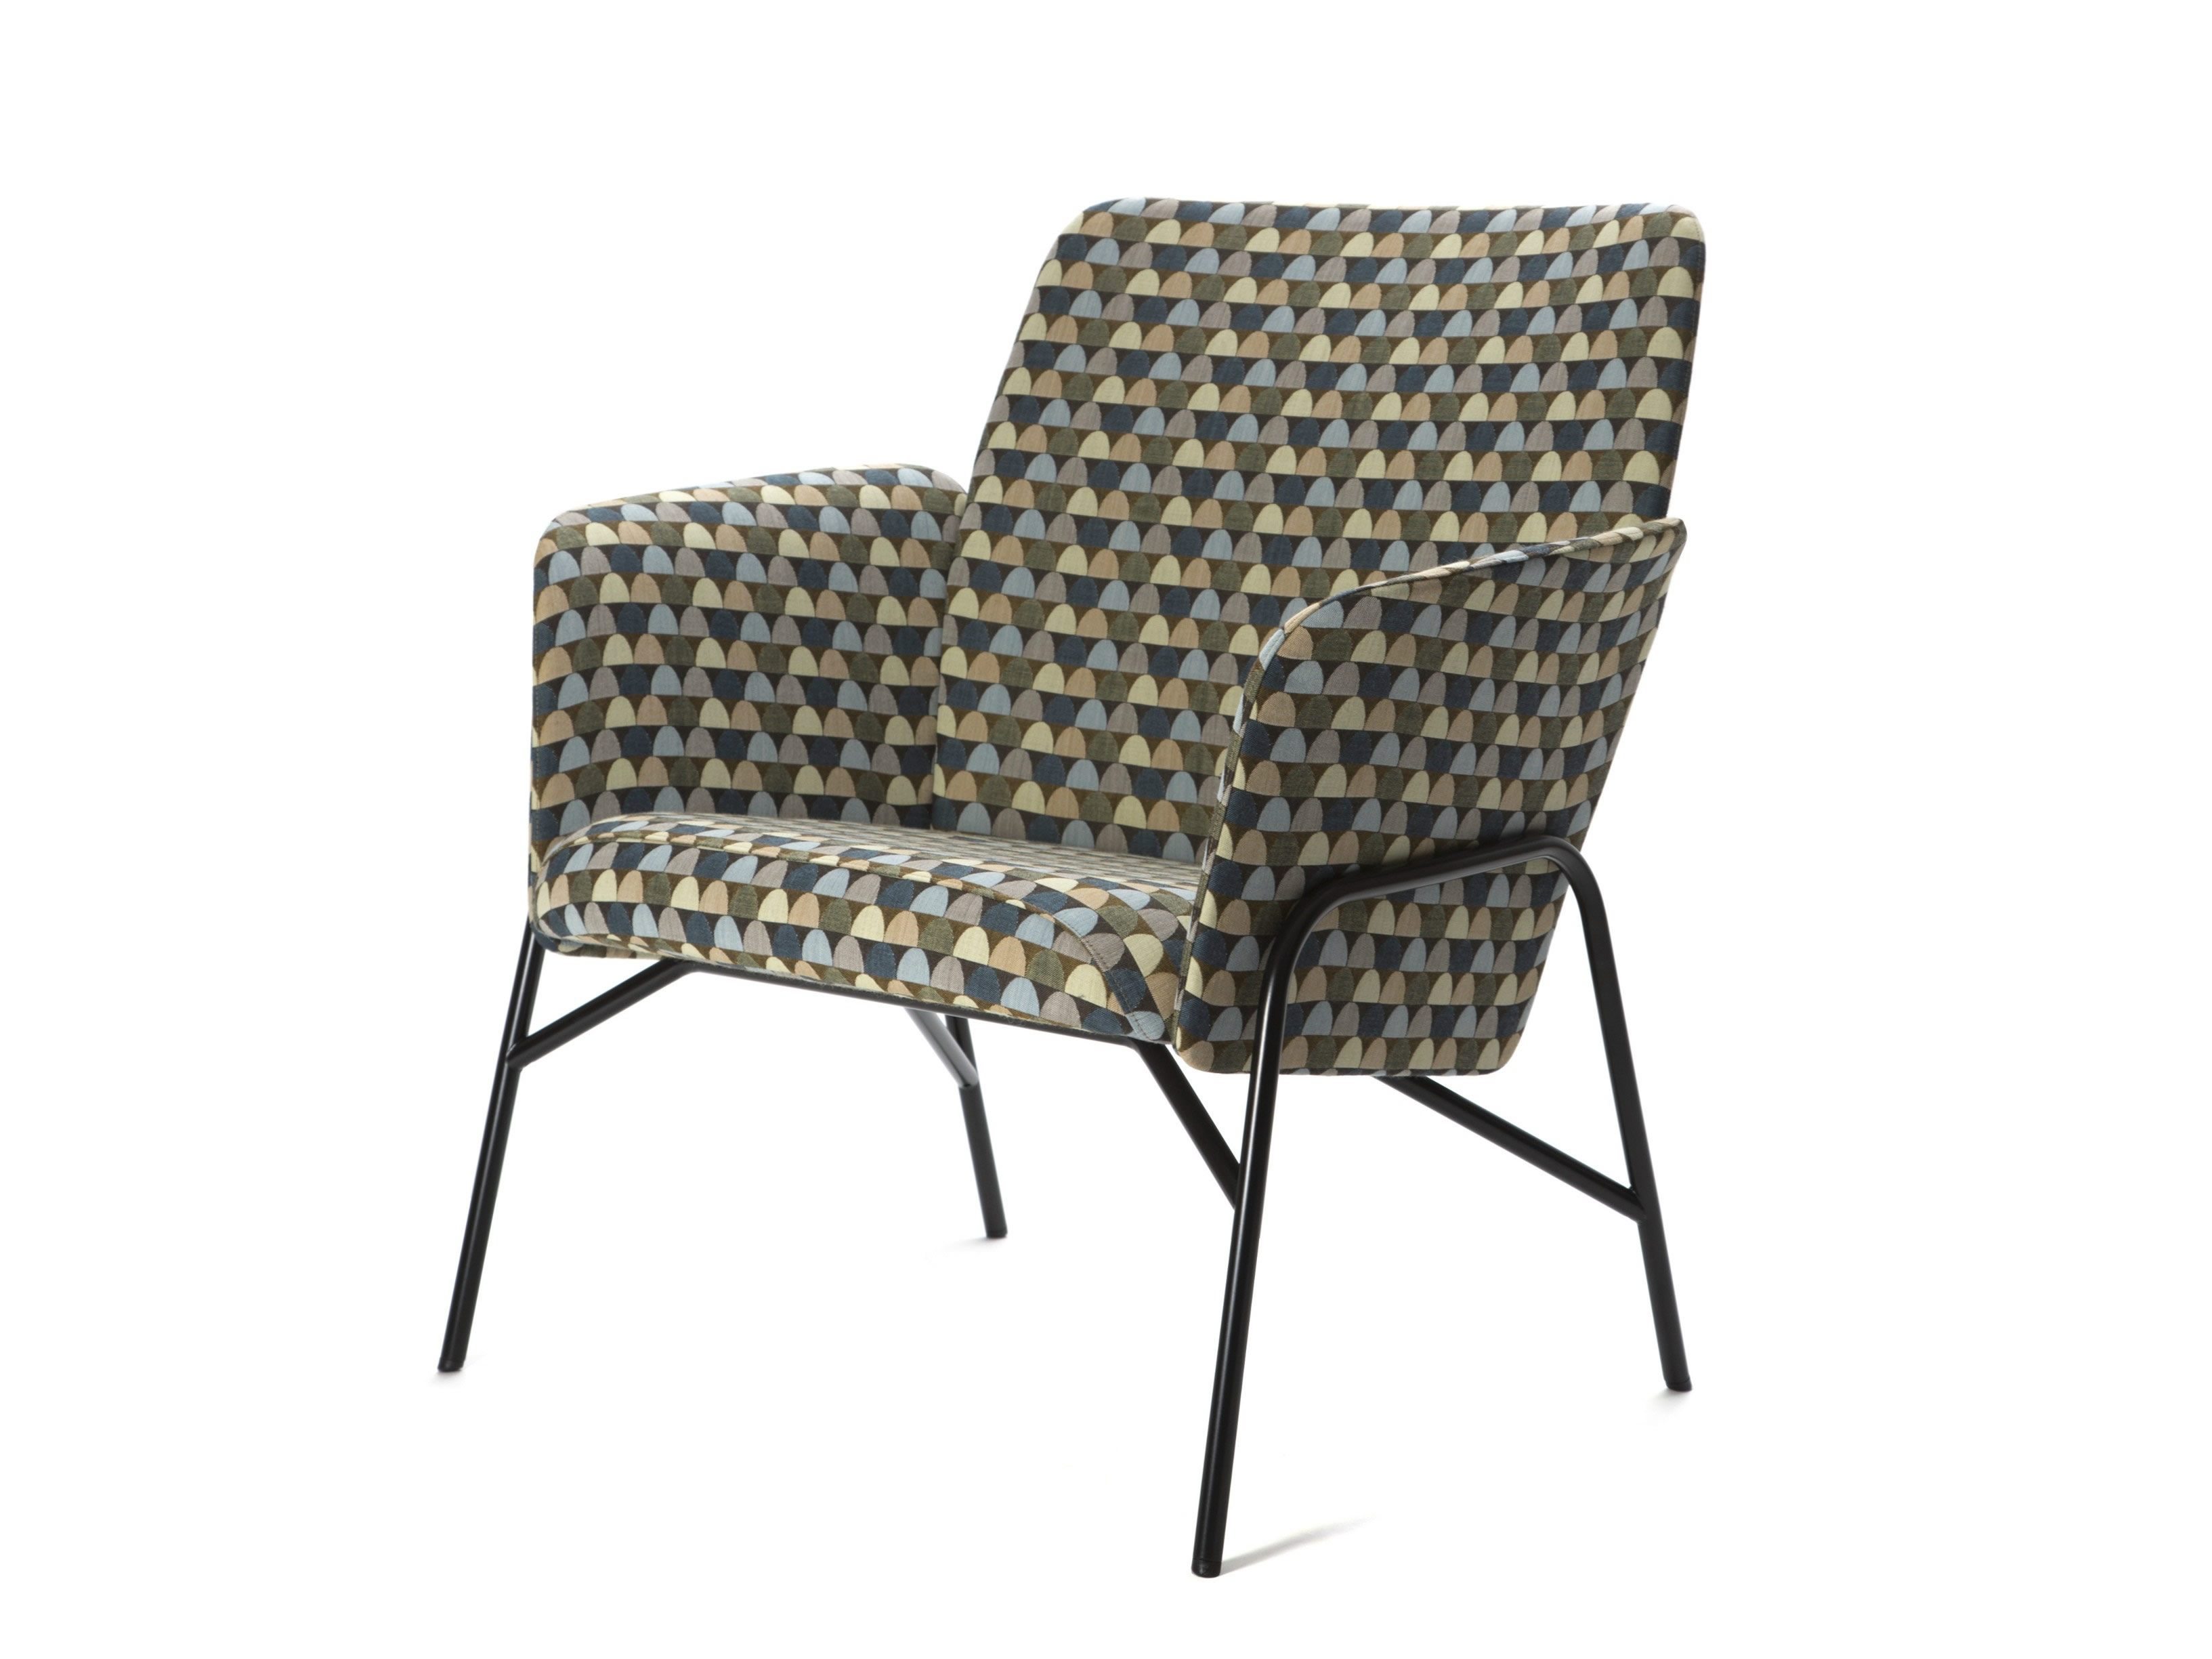 Taivu Lounge Chair by Mikko Laakkonen for Inno